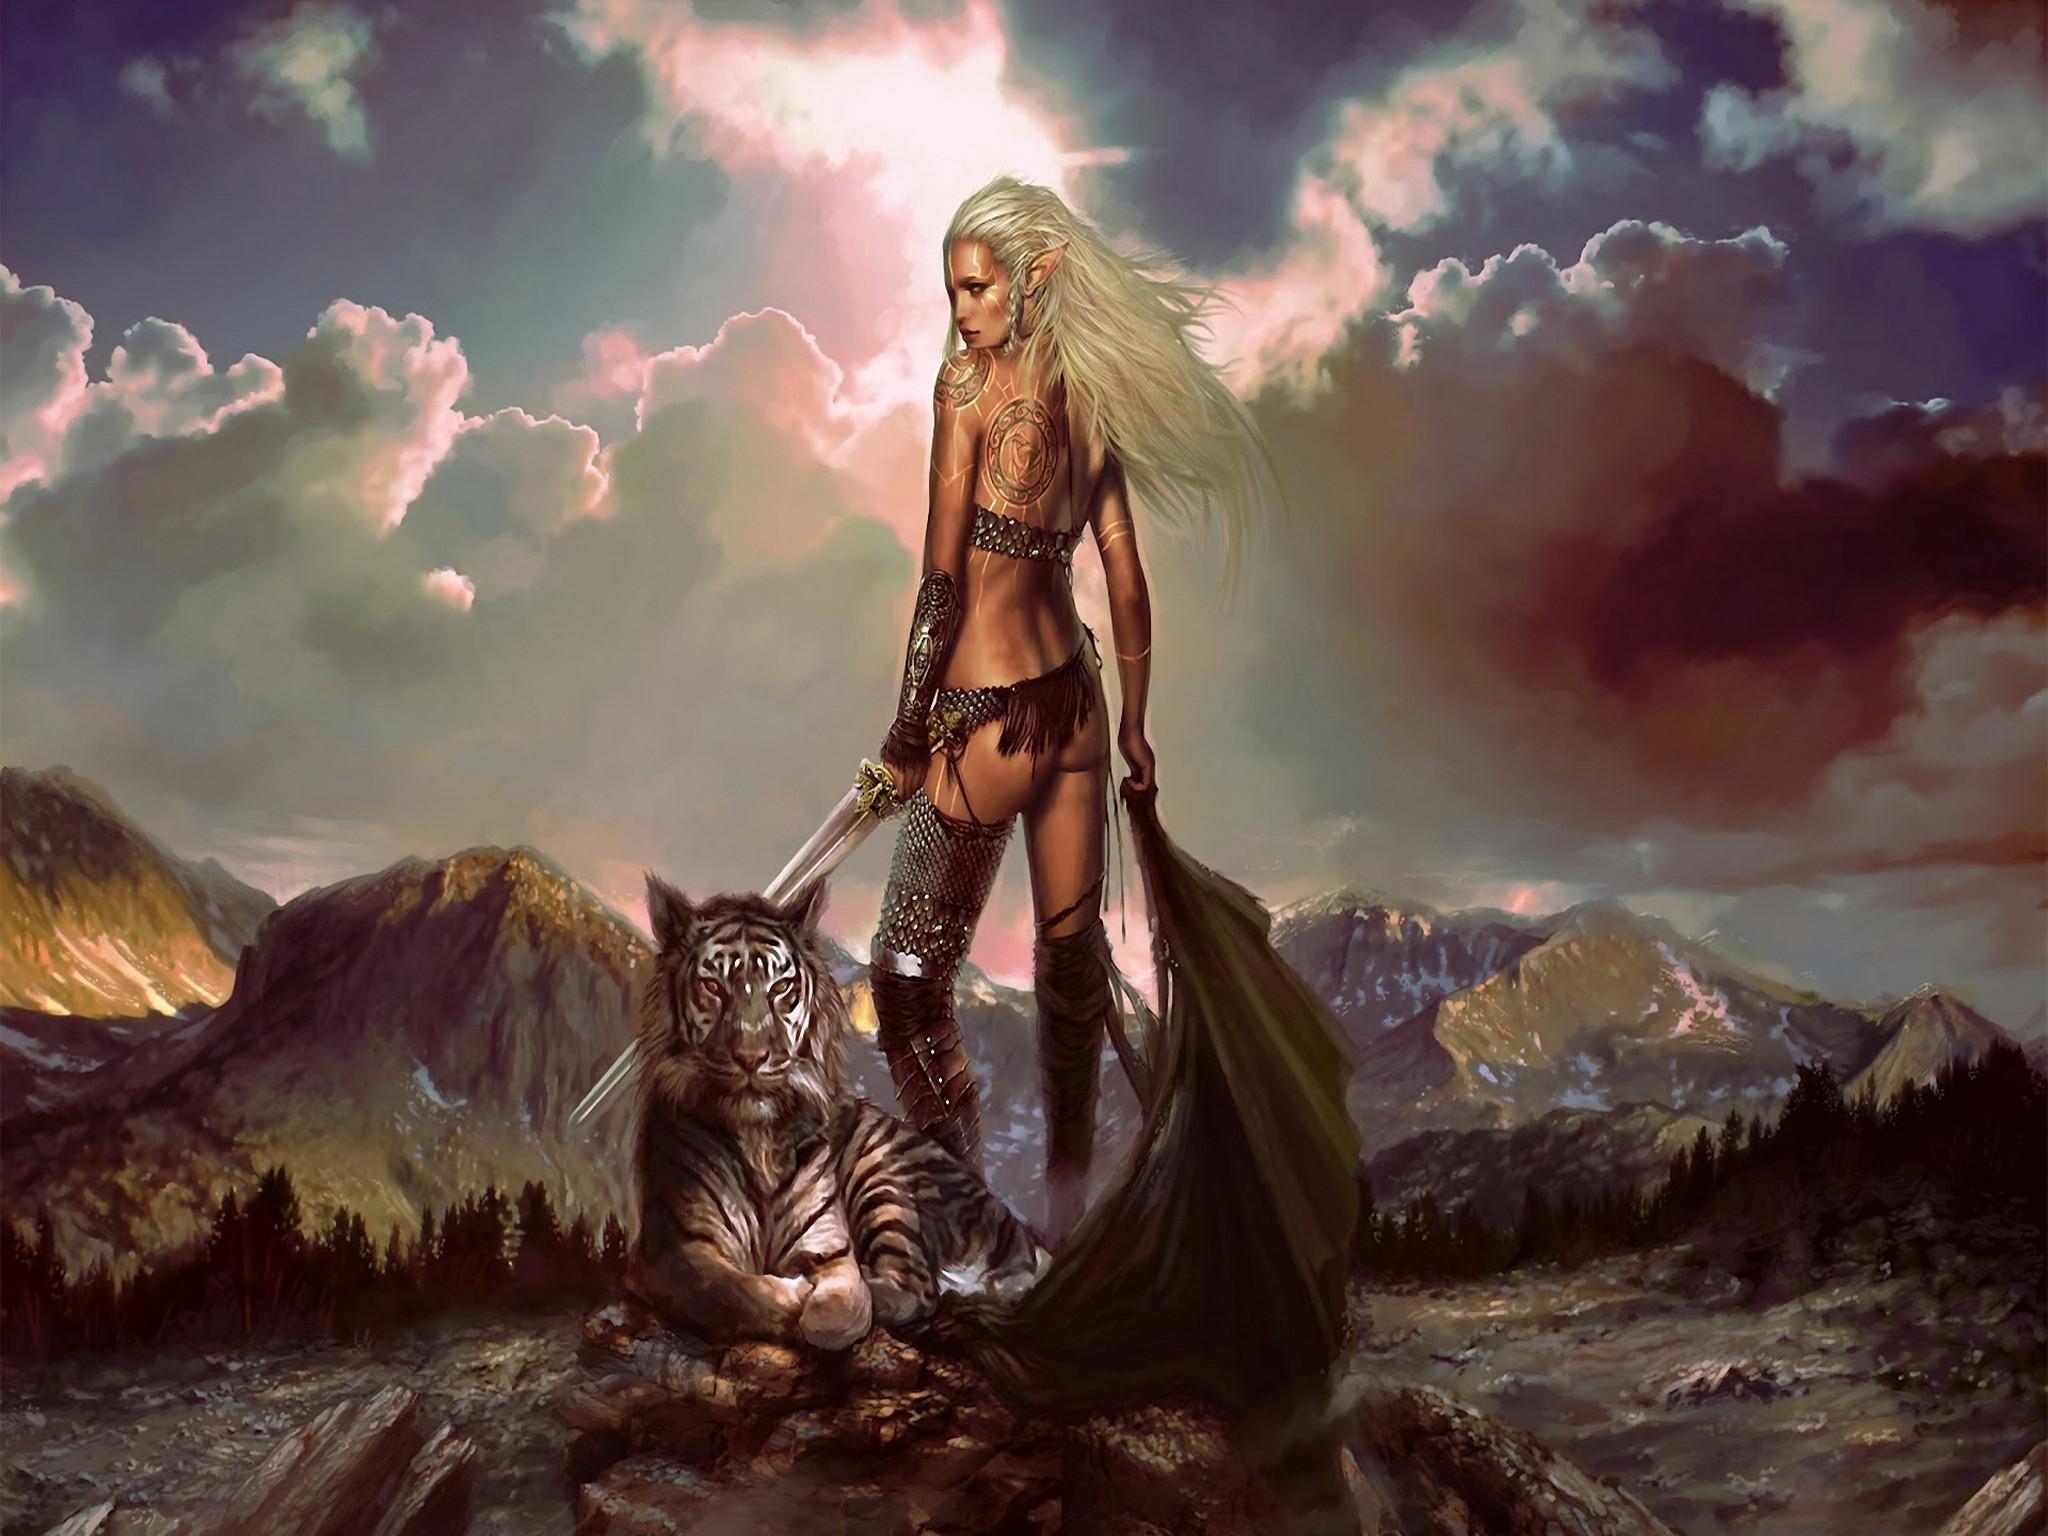 elf pictures and images   elf, Warrior, tiger ipad wallpaper